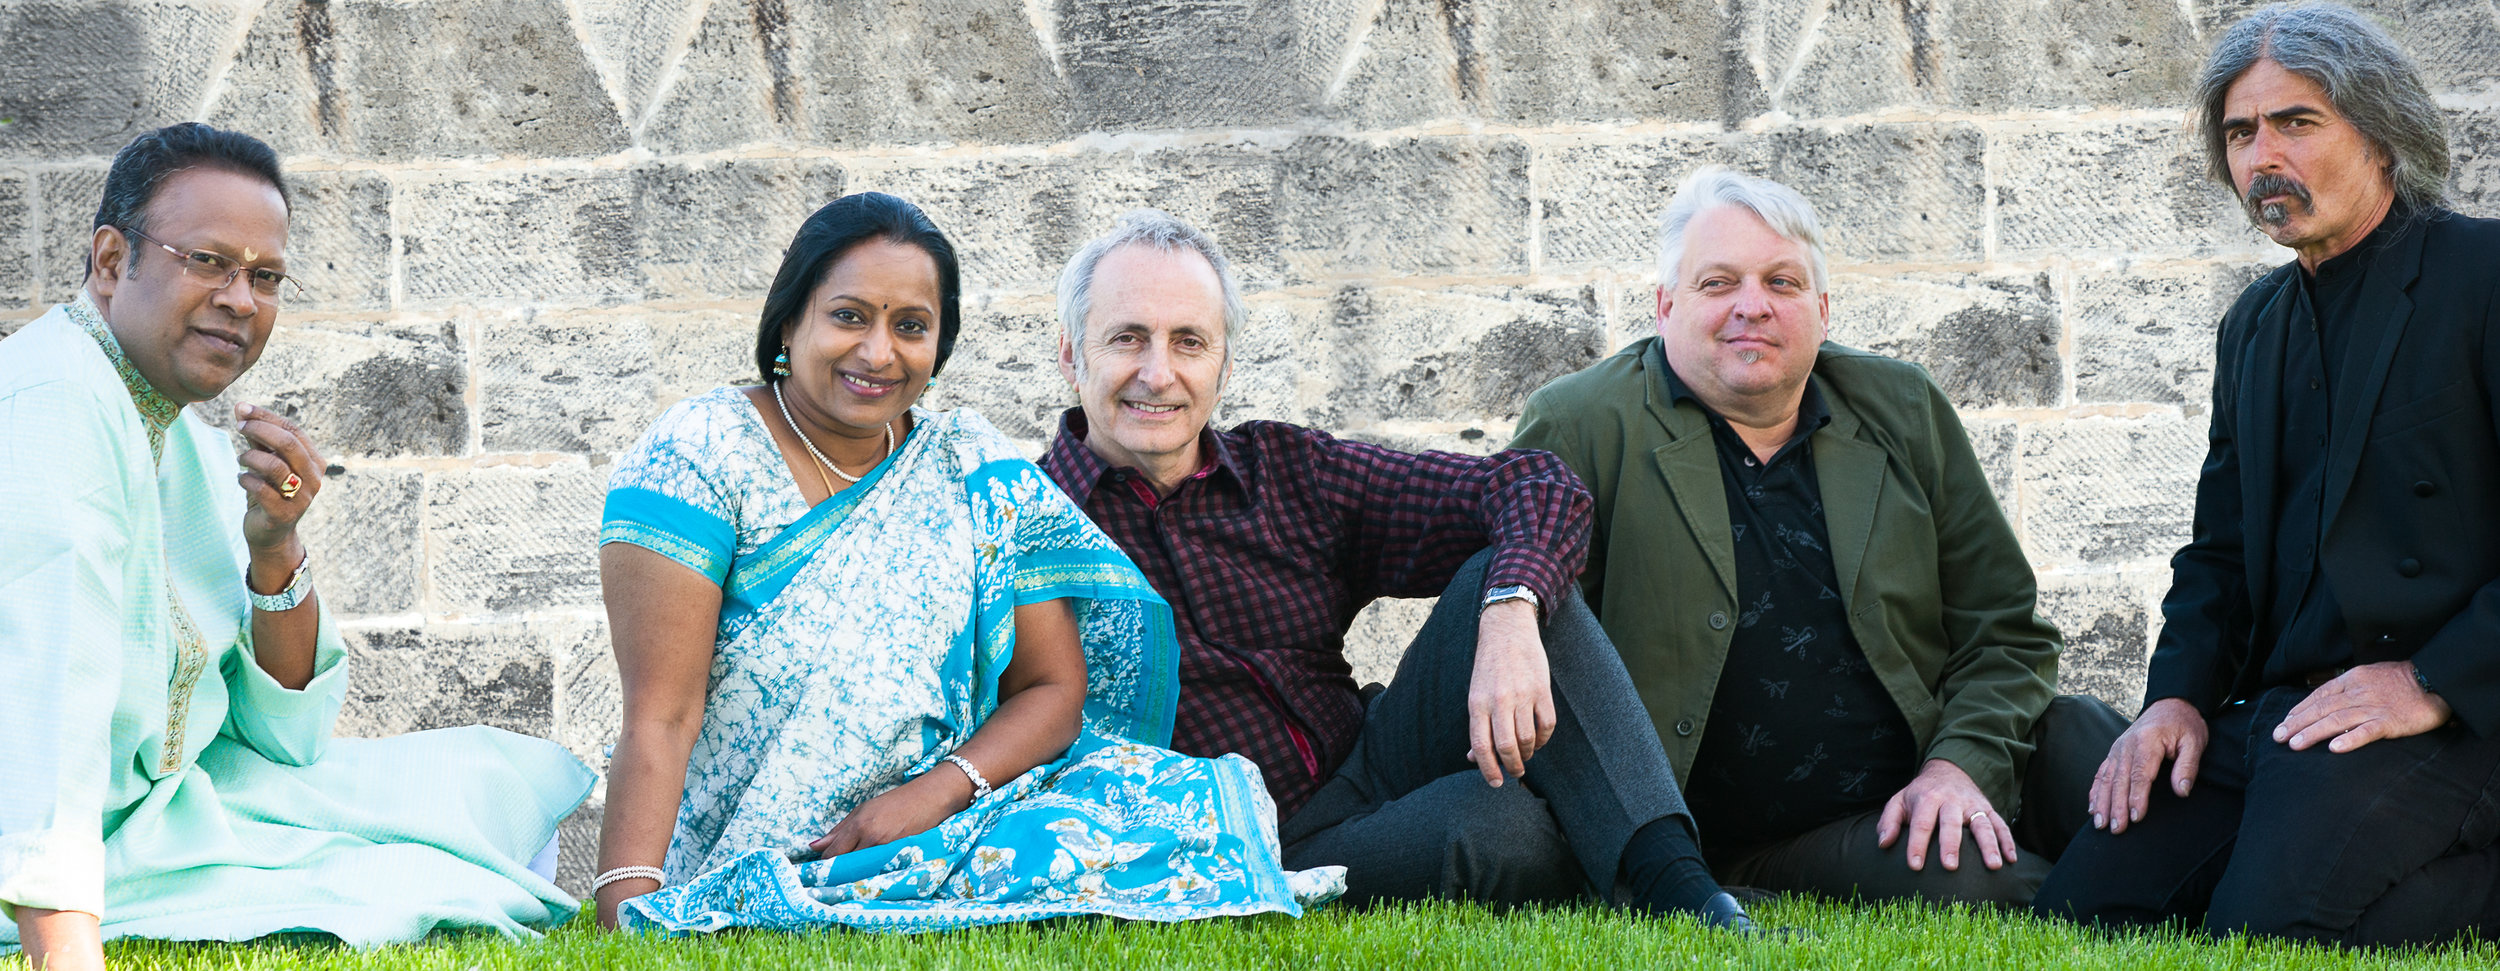 "Voices of Sepharad musiciansBoopathi, Nirmala Rajasekar, David Jordan Harris, David Burk, Mick LaBriola in ""Song of Wonder""   Photo by ReyMash Photogra phy  jpg download (5.9 MB)"